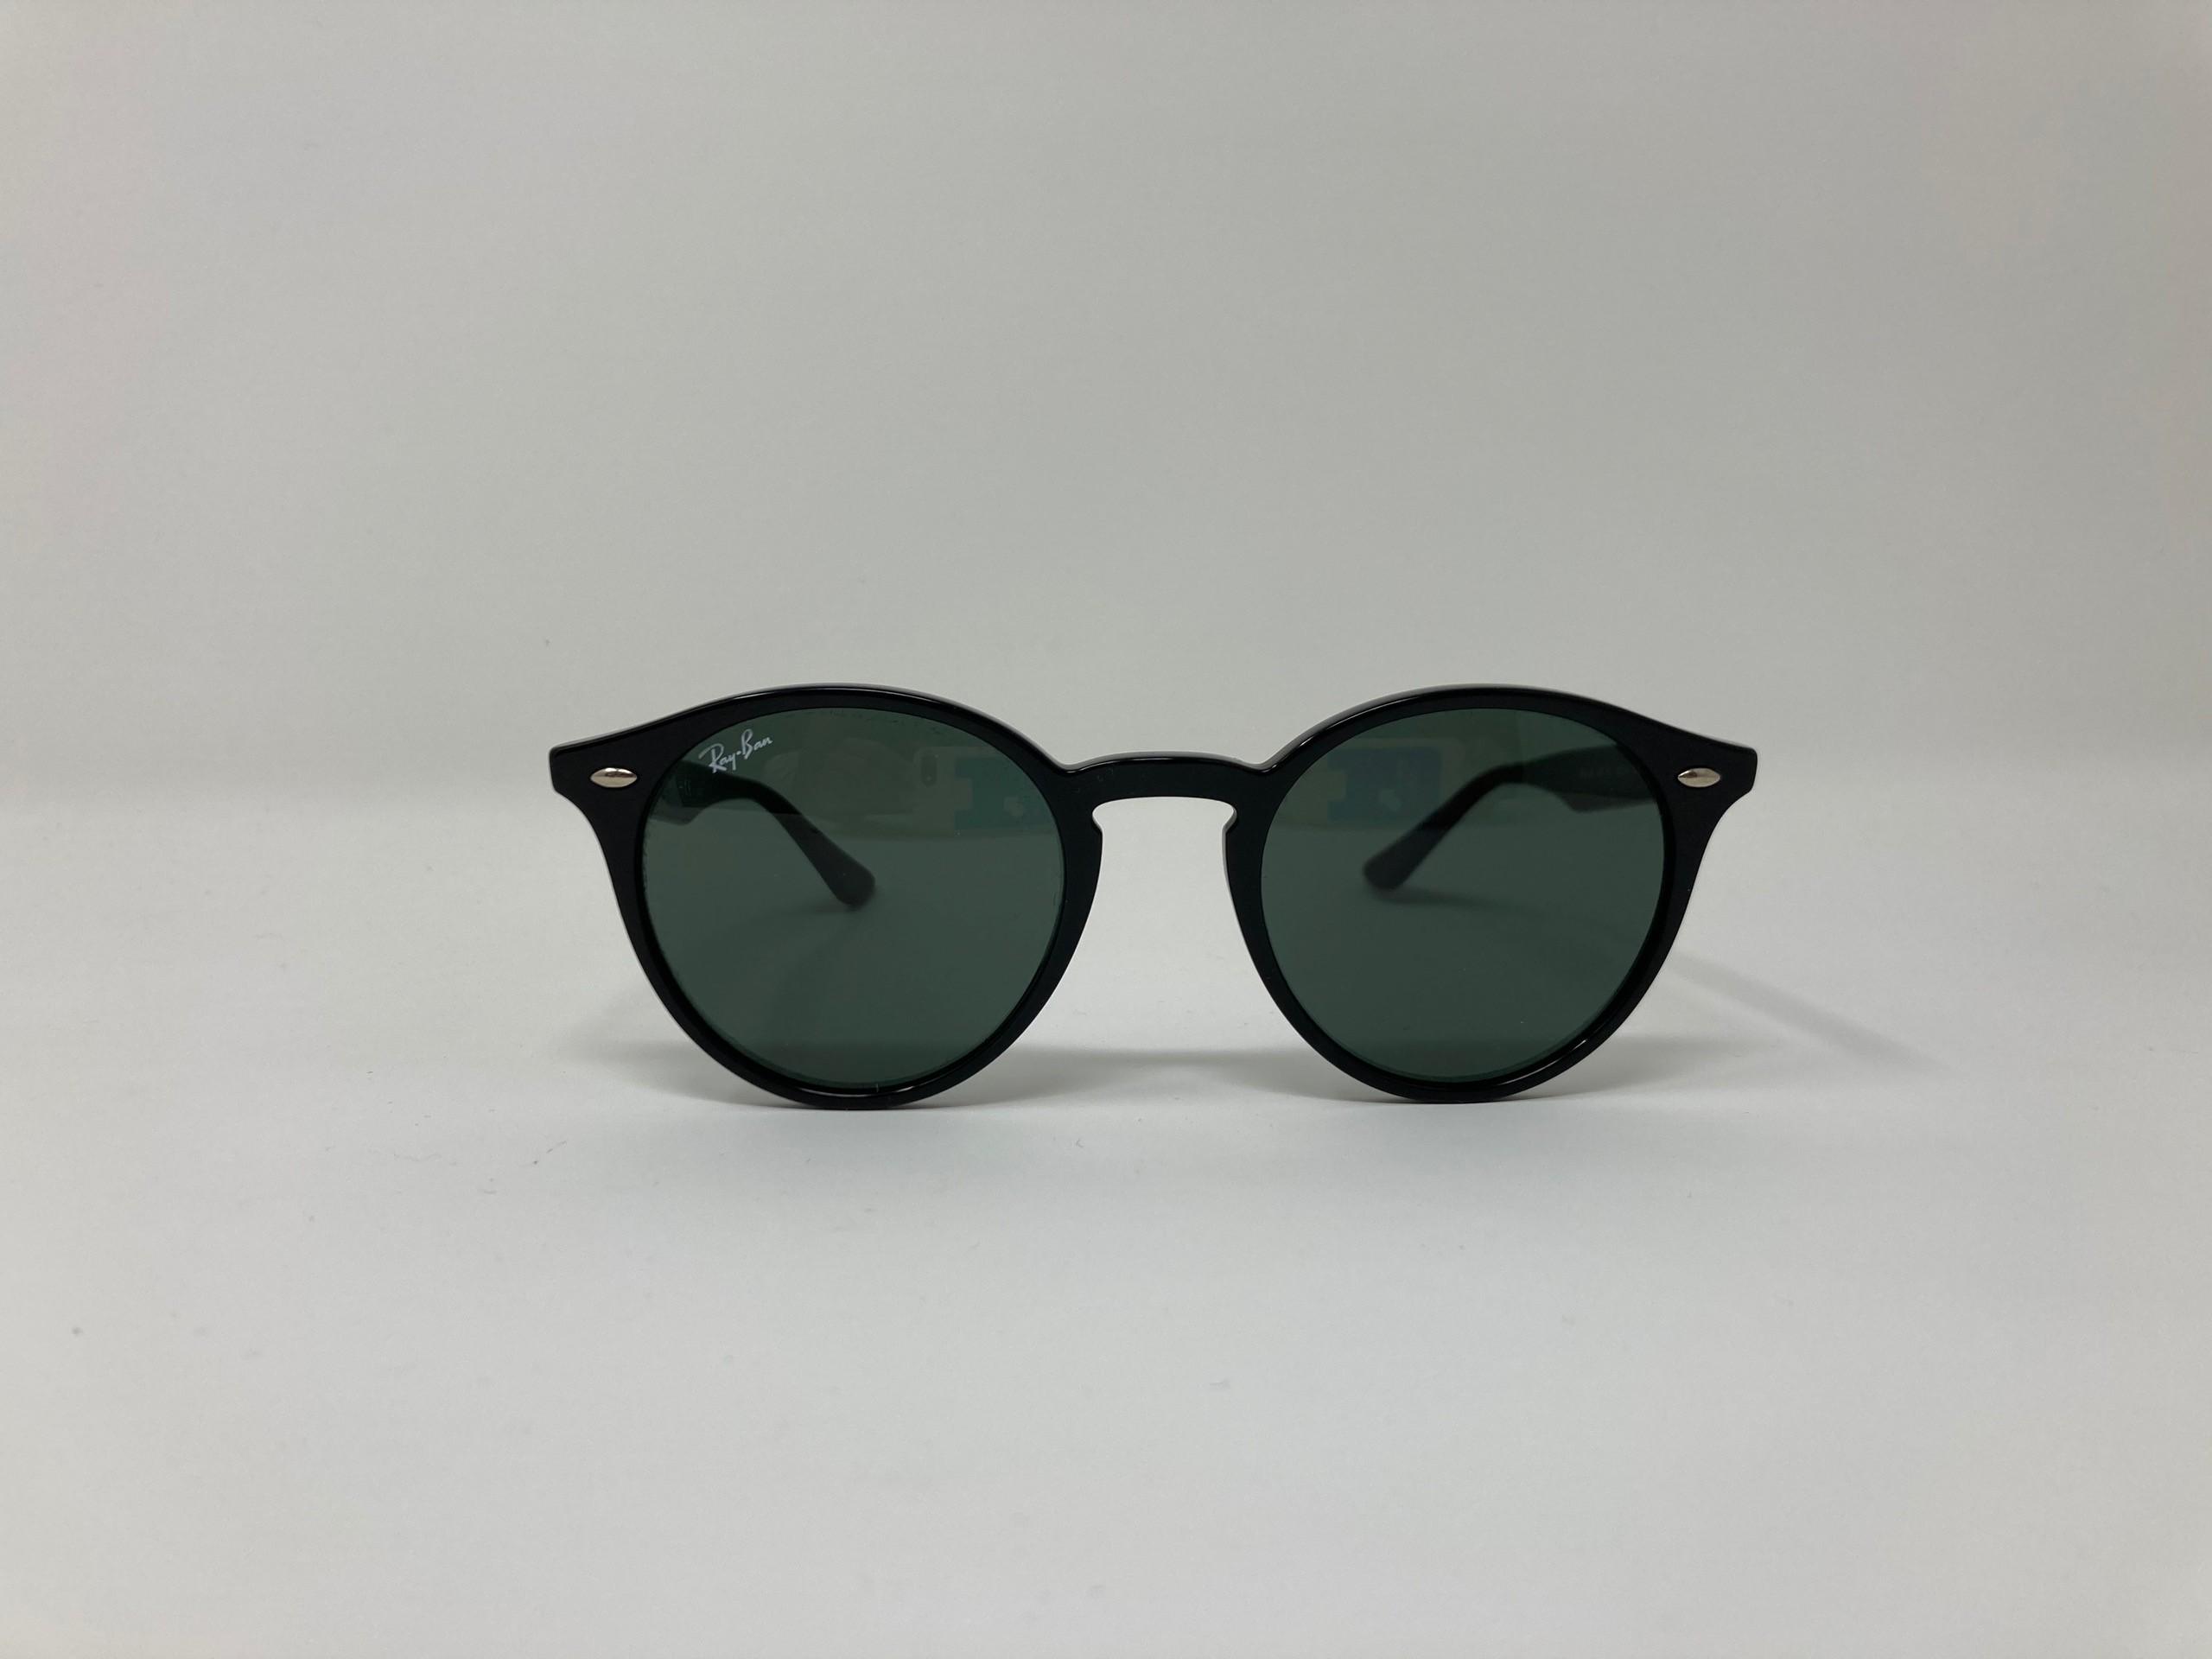 Ray Ban RB 2180 Unisex sunglasses